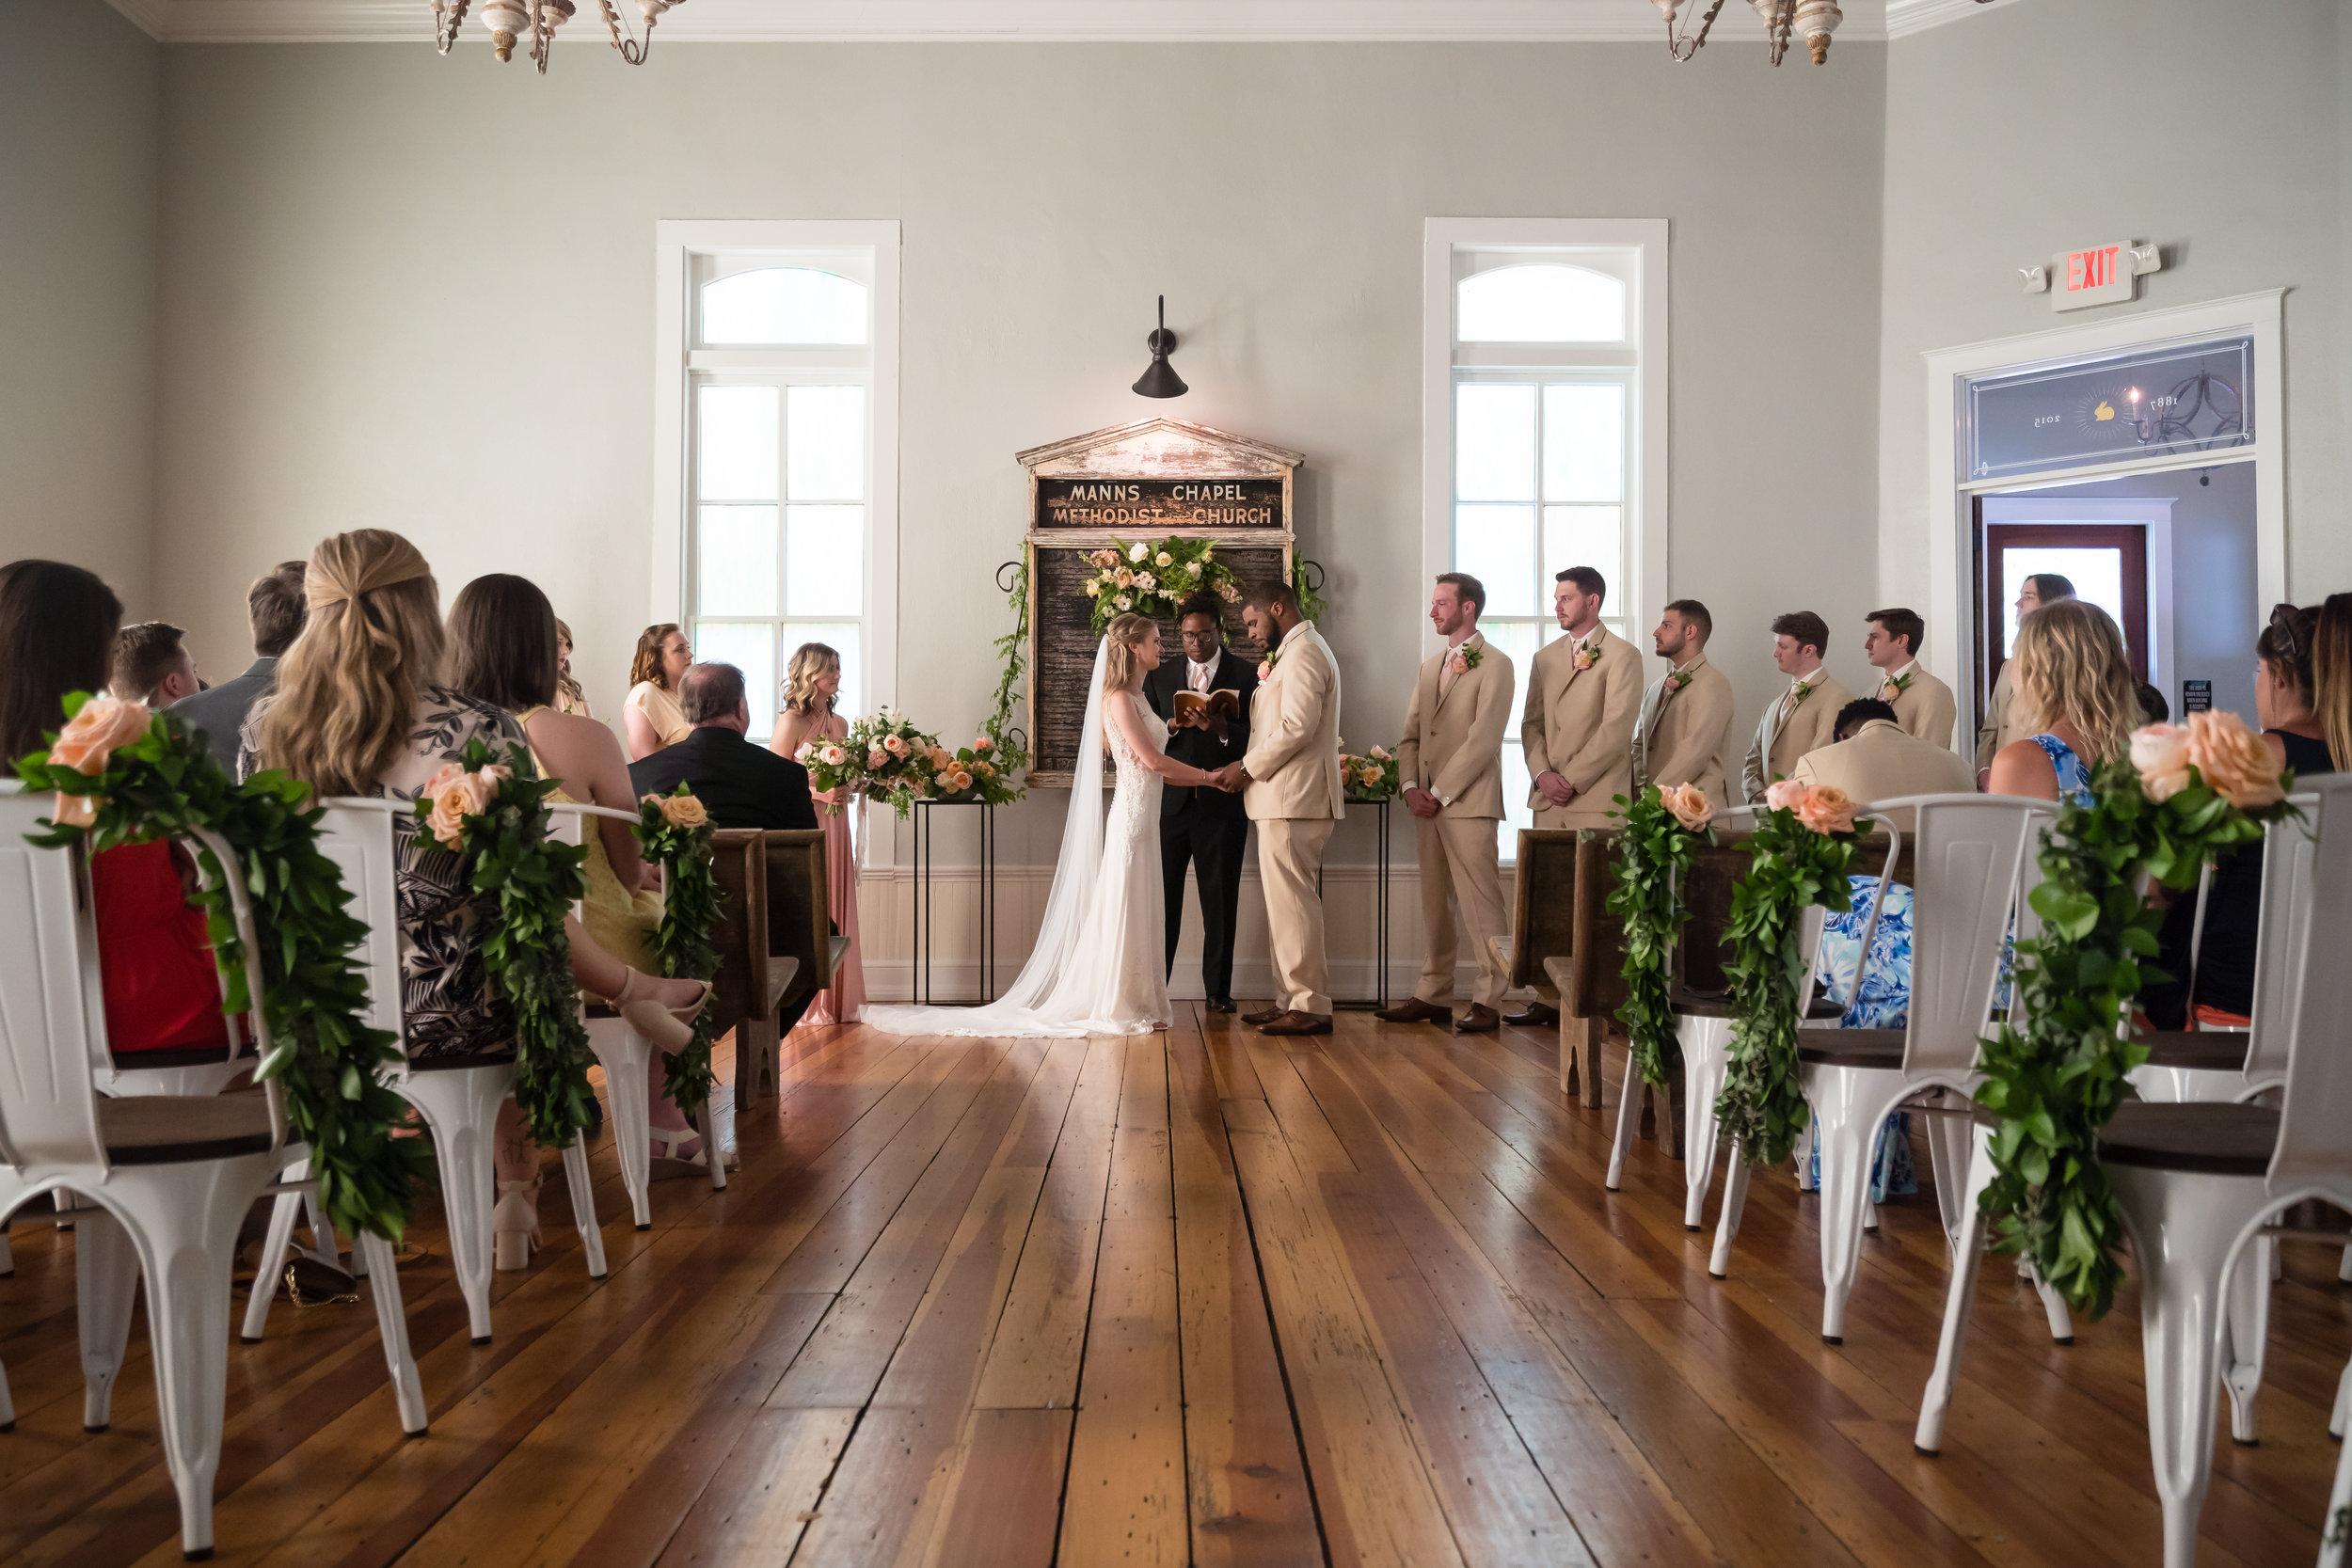 sarah_ikeem_wedding_at_the_parlour_at_manns_chapel_05.18.19-02530.jpg